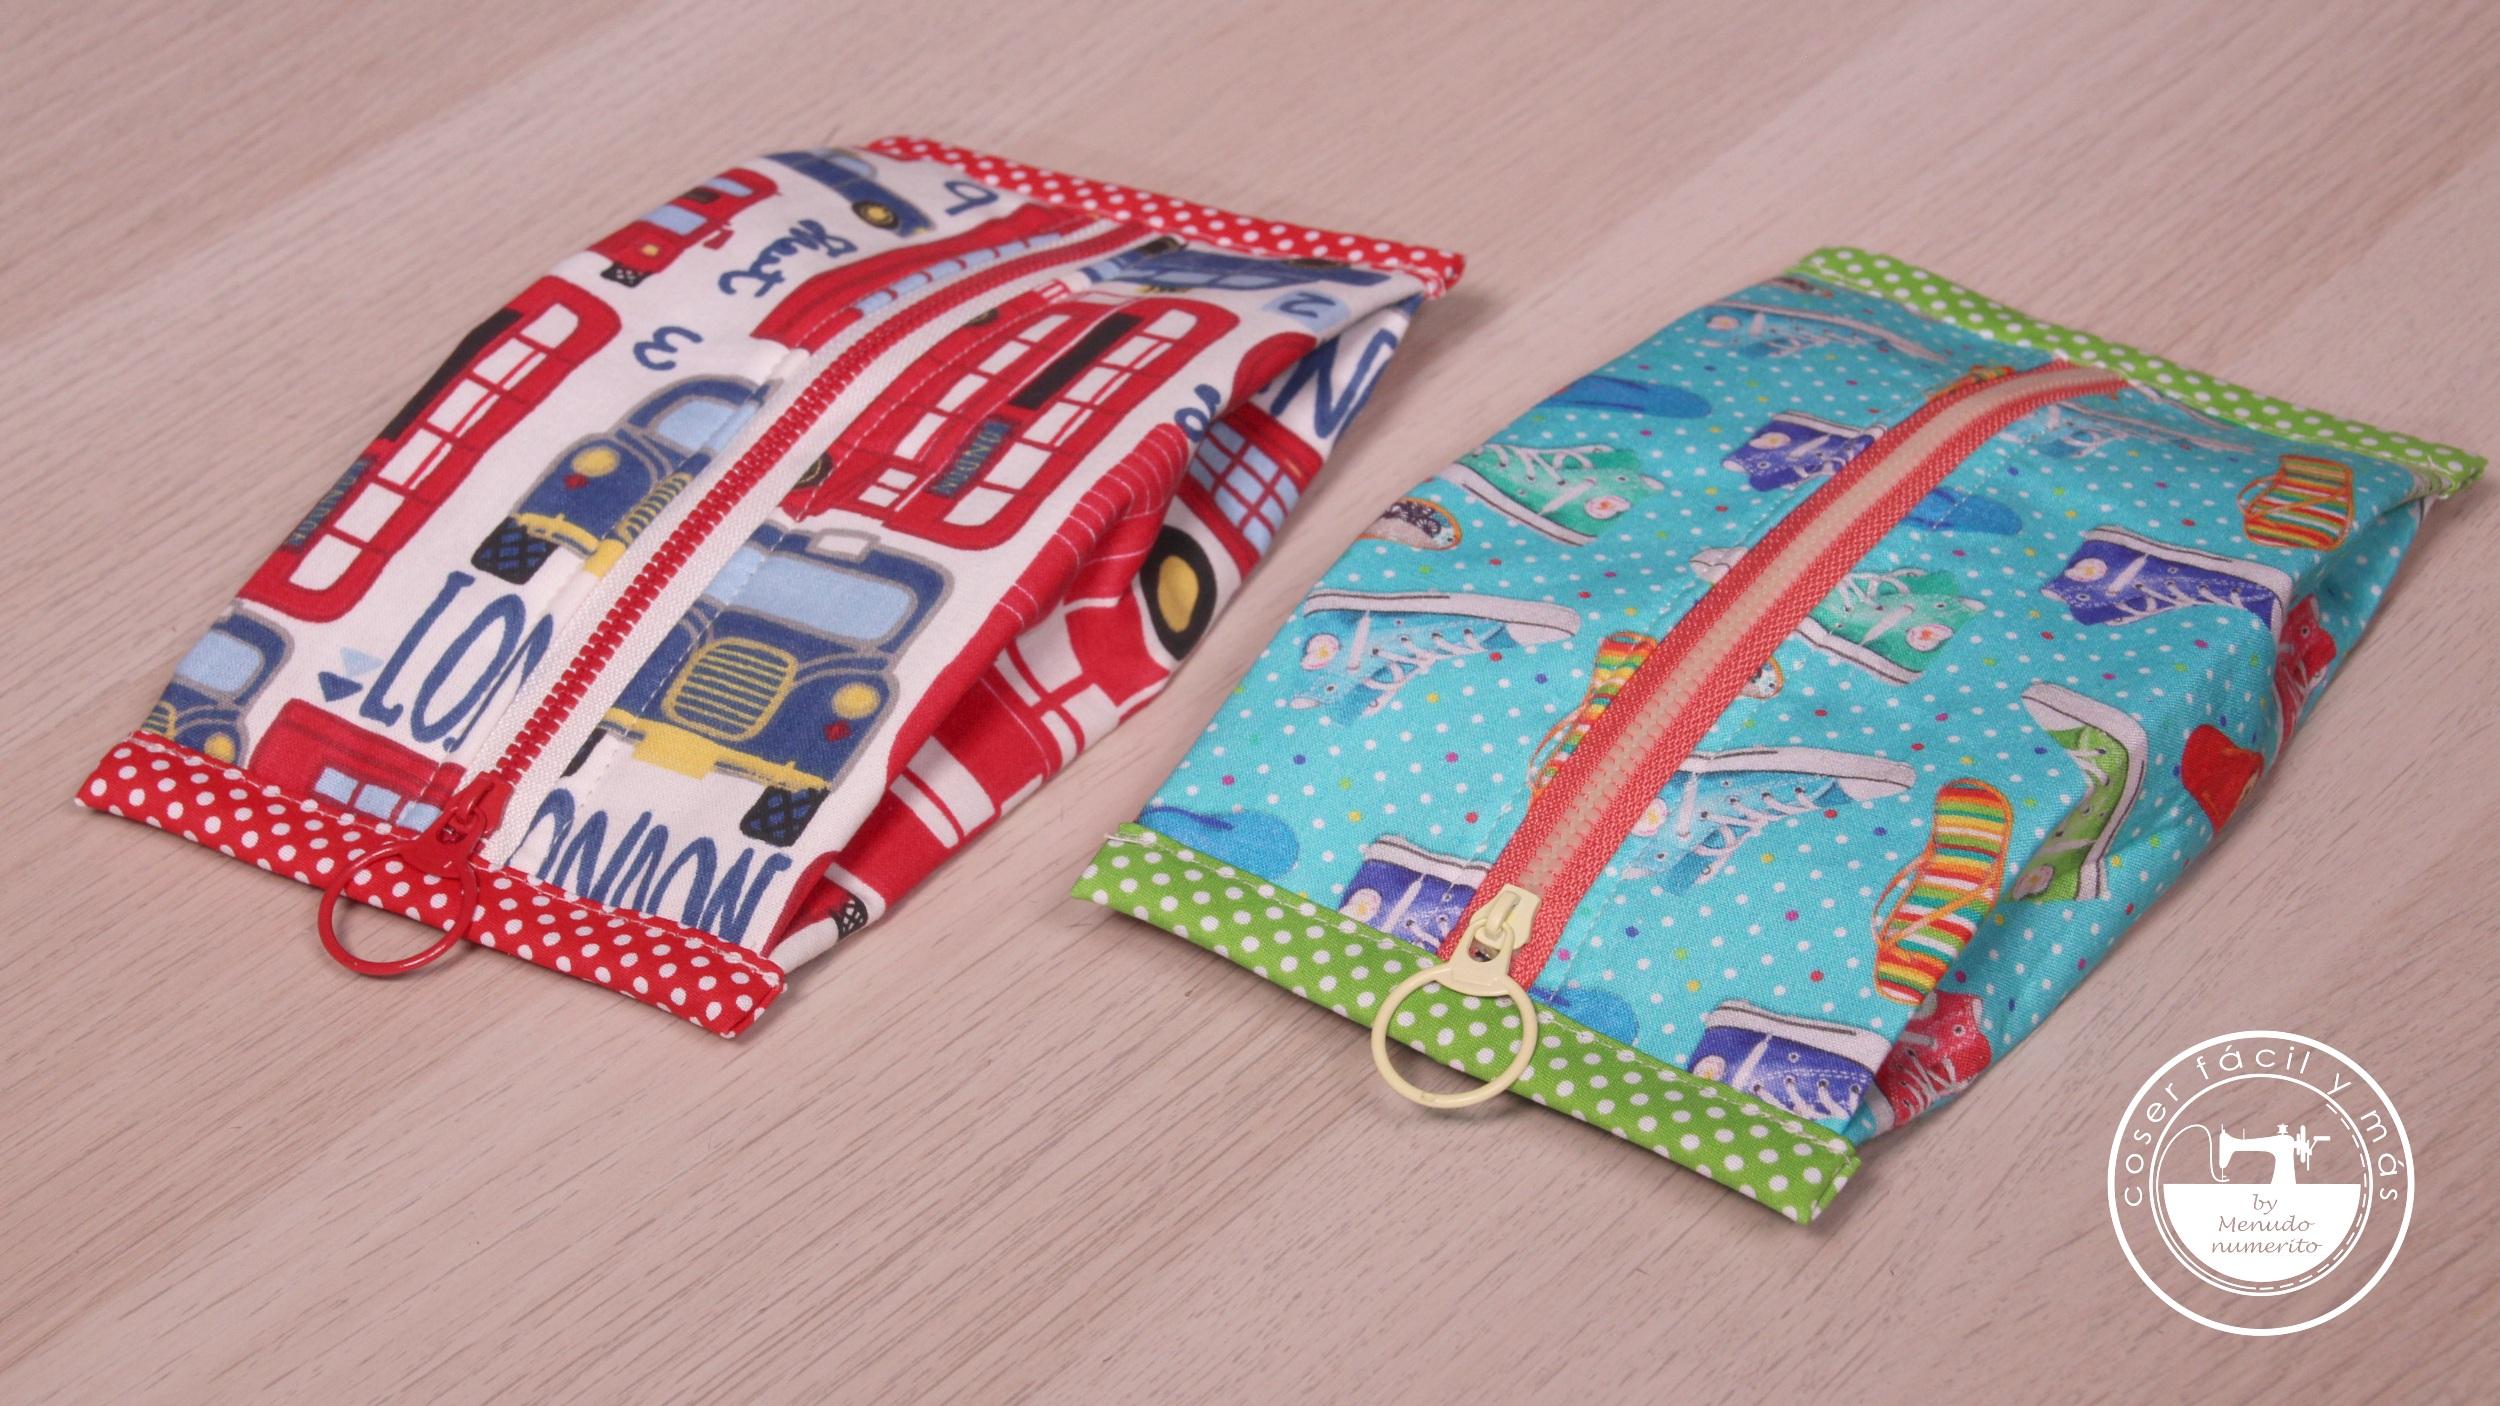 estuche neceser bolsa de palomitas coser facil menudo numerito blogs de costura tutorial